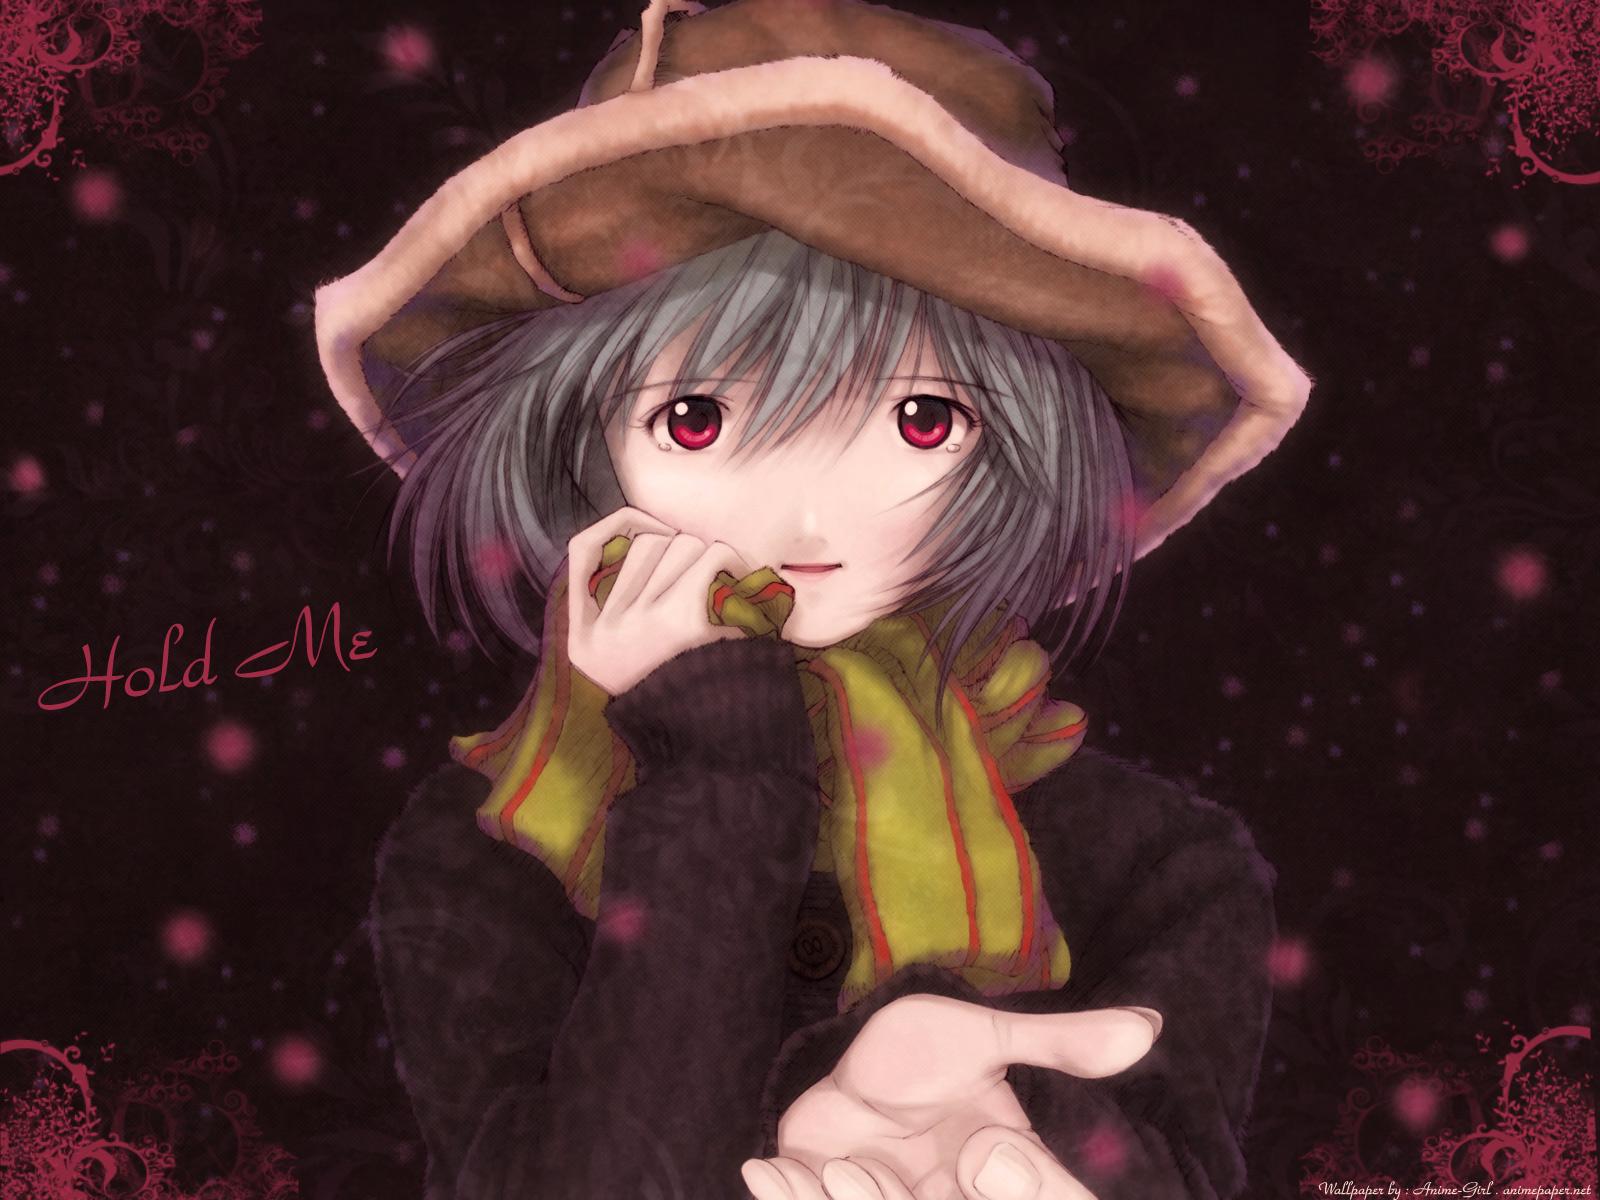 ayanami_rei kobayashi_yuji nagko neon_genesis_evangelion yuji